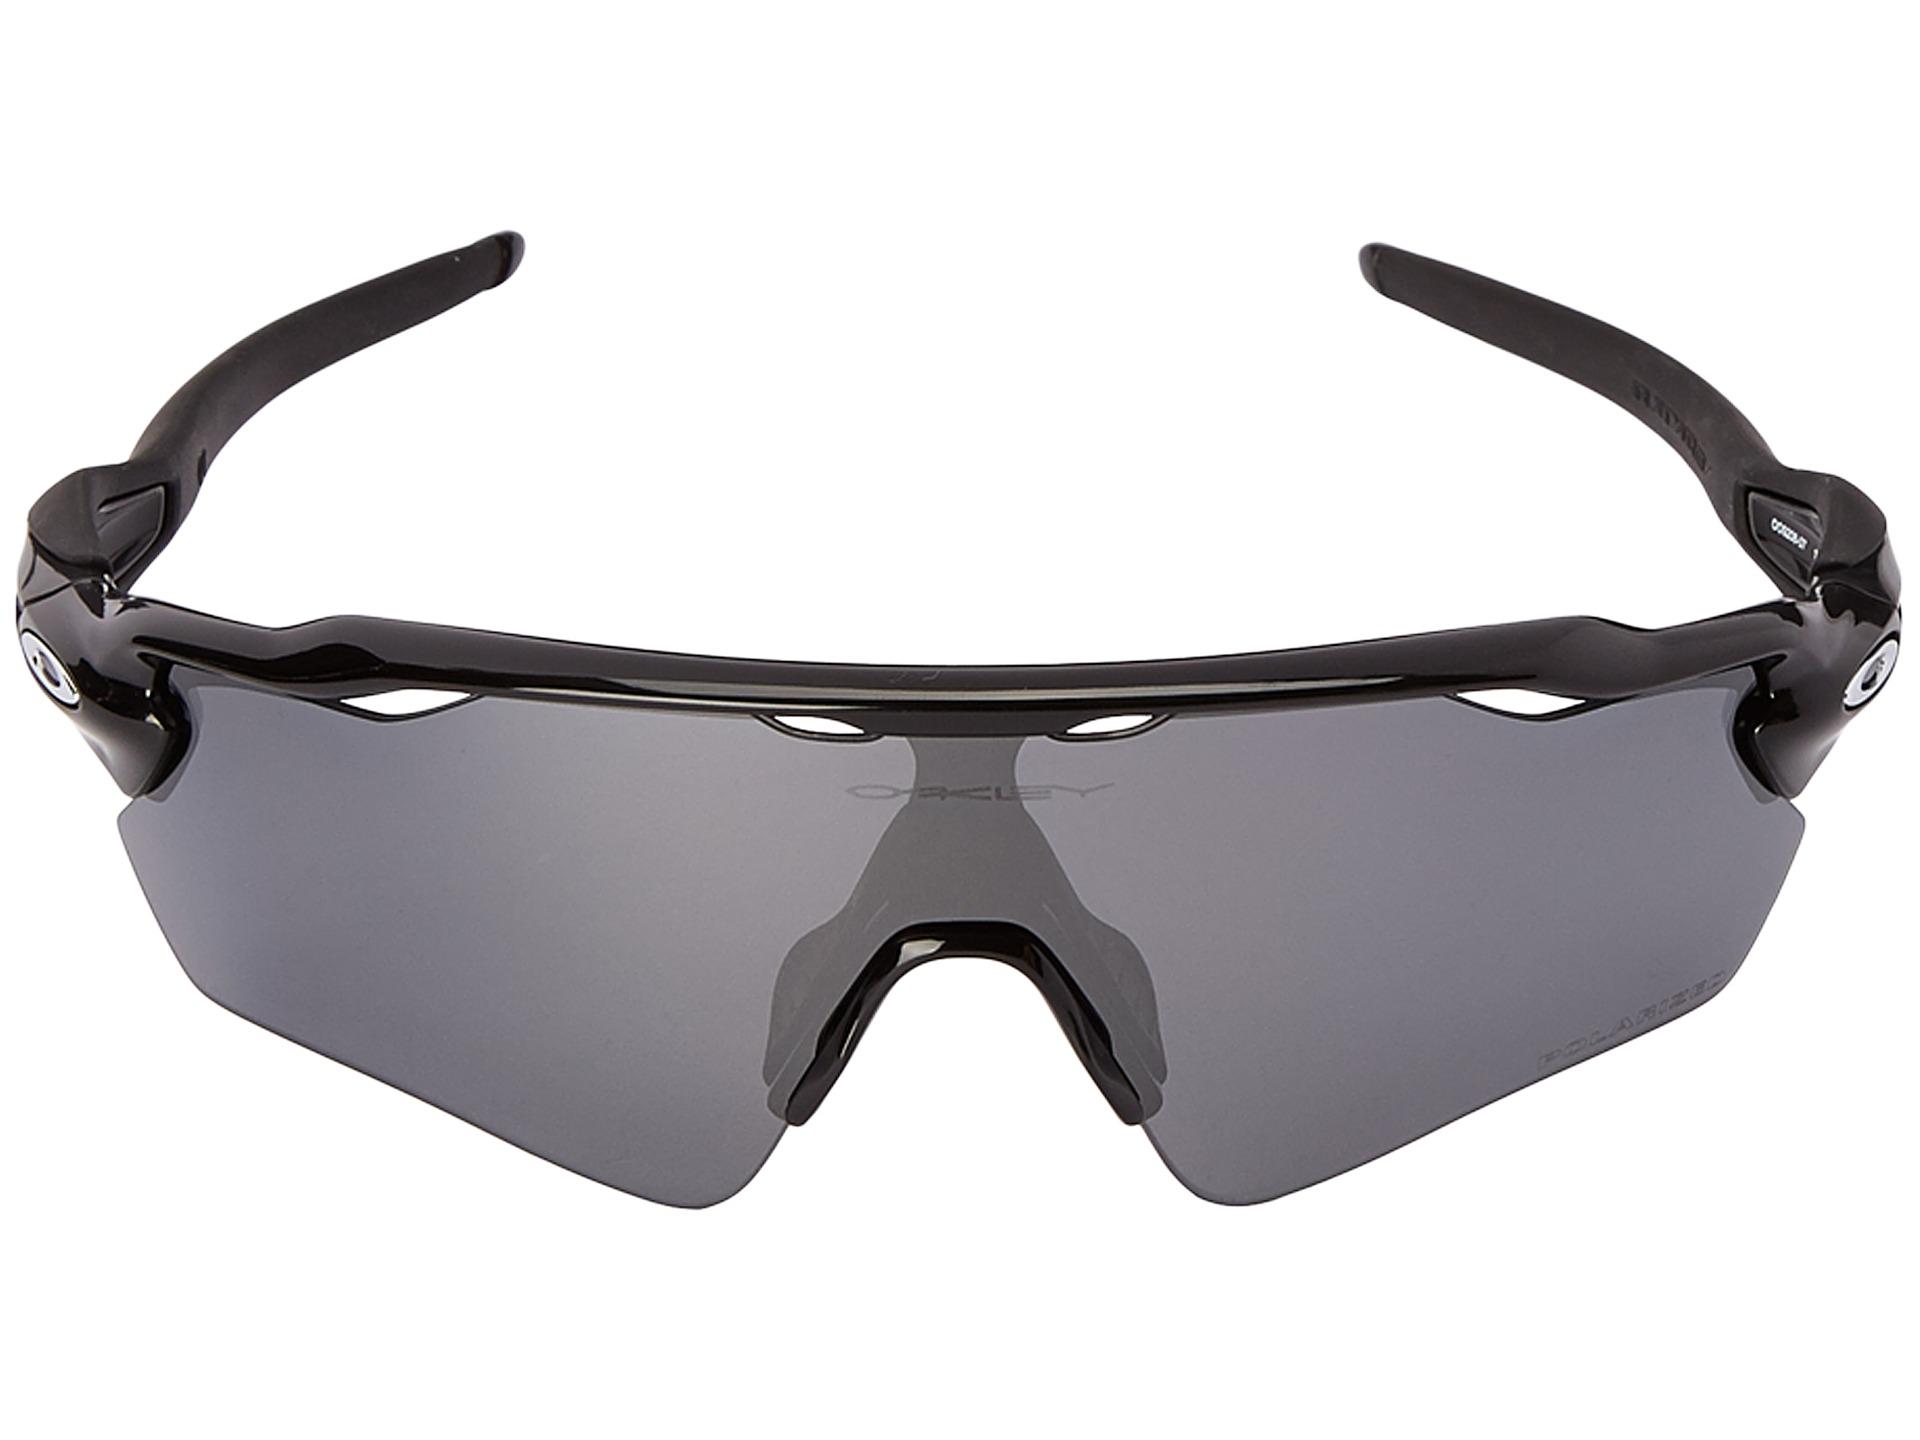 Oakley Glasses Frame Parts : oakley sunglass parts